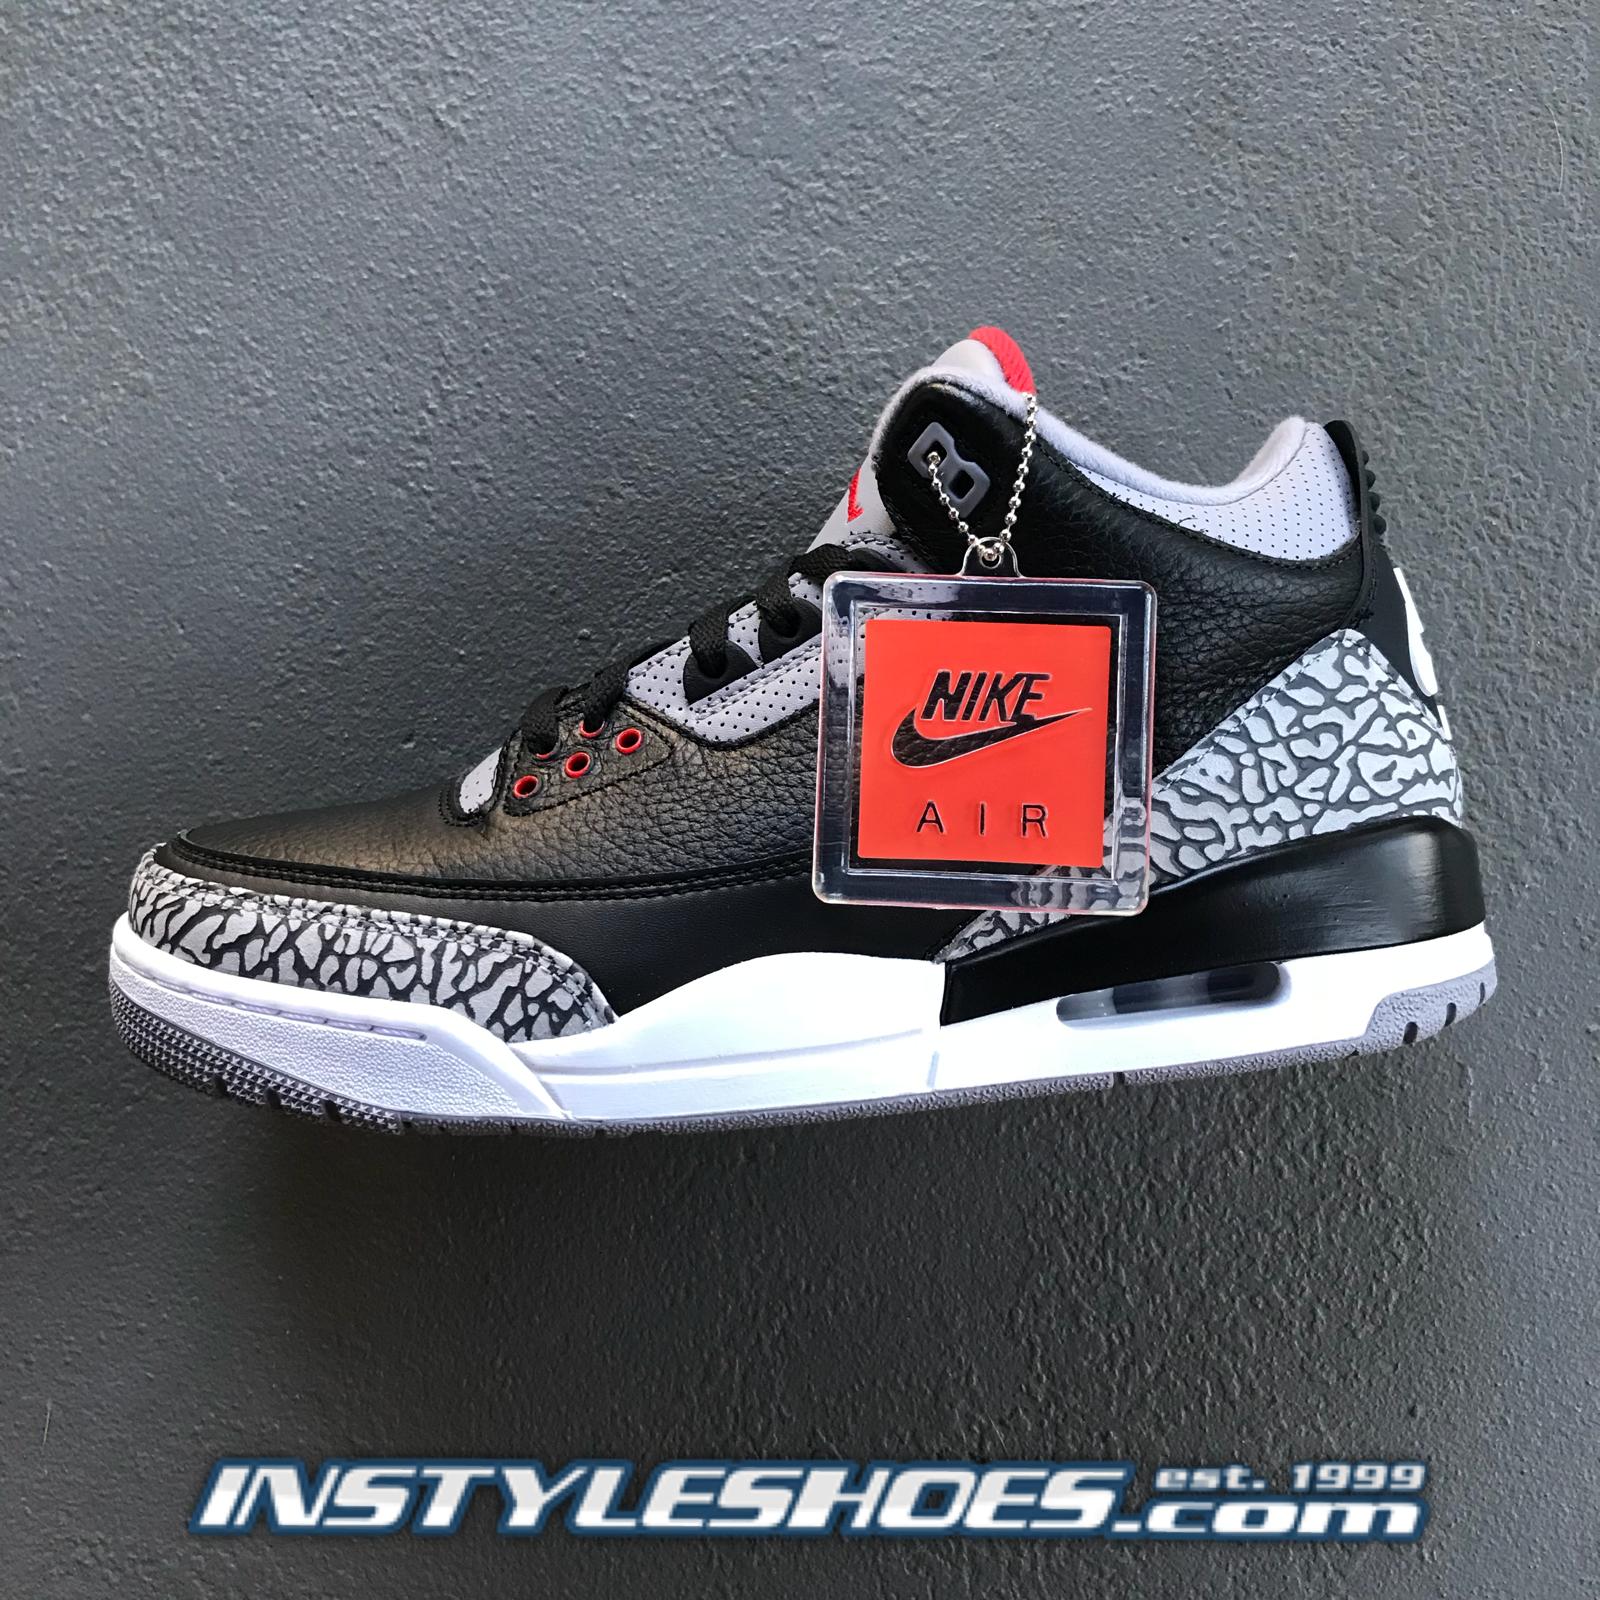 3cf407a67bf1 Nike Air Jordan 3 OG Black Black Black Cement Grey 2018 Retro 854262-001 88  a704ae